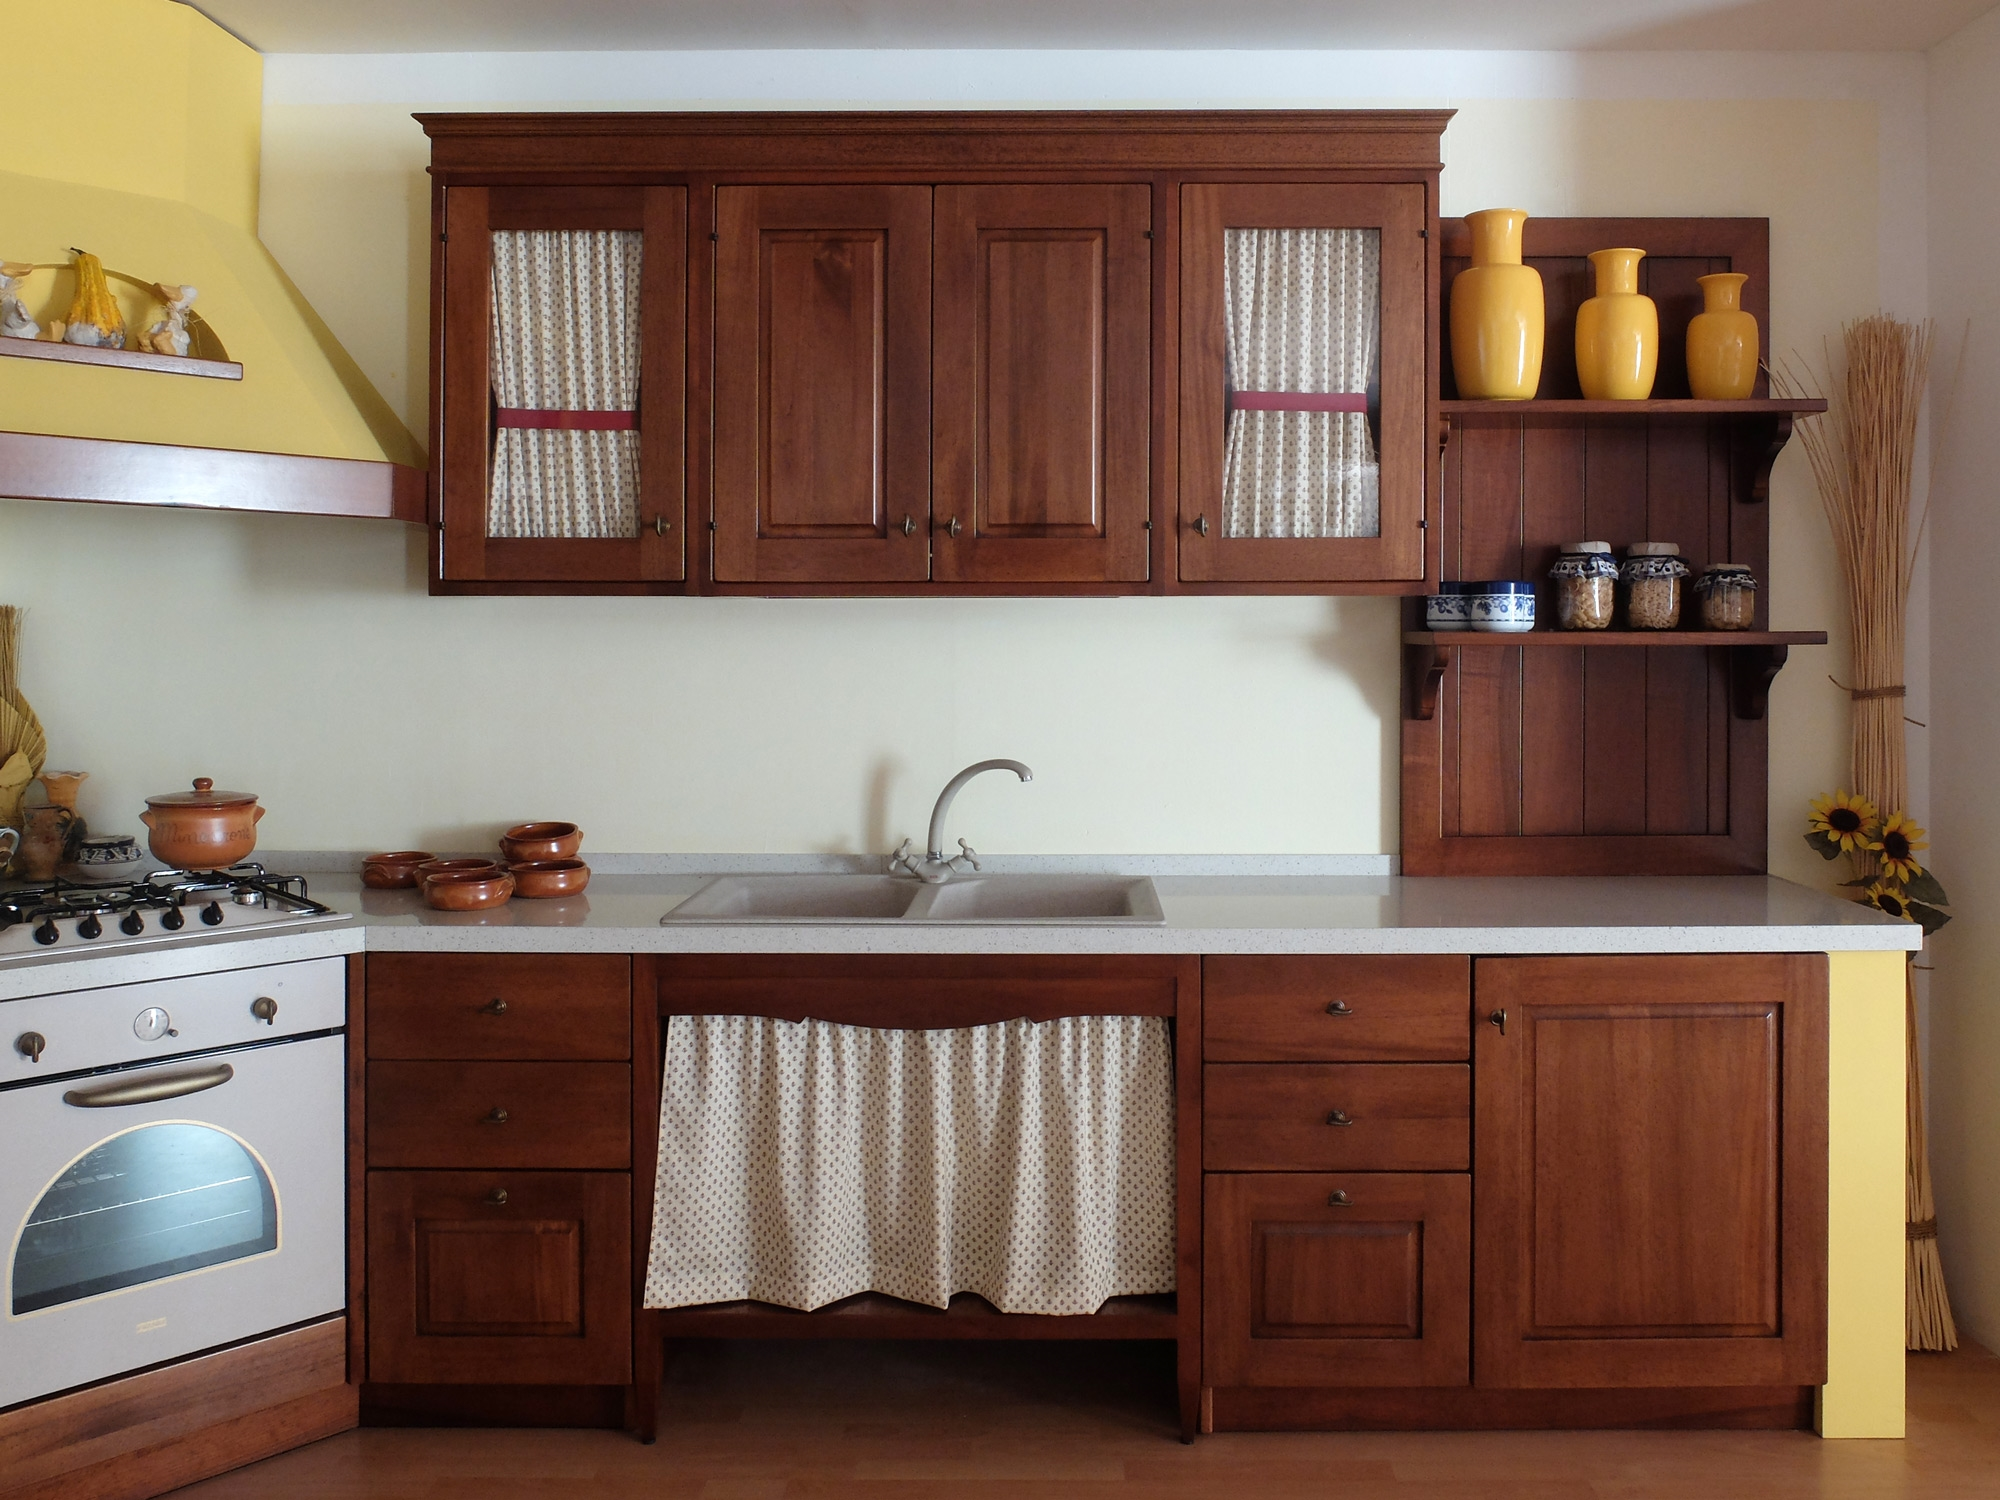 Strutture per cucine componibili armadi componibili idee - Strutture per cucine componibili ...